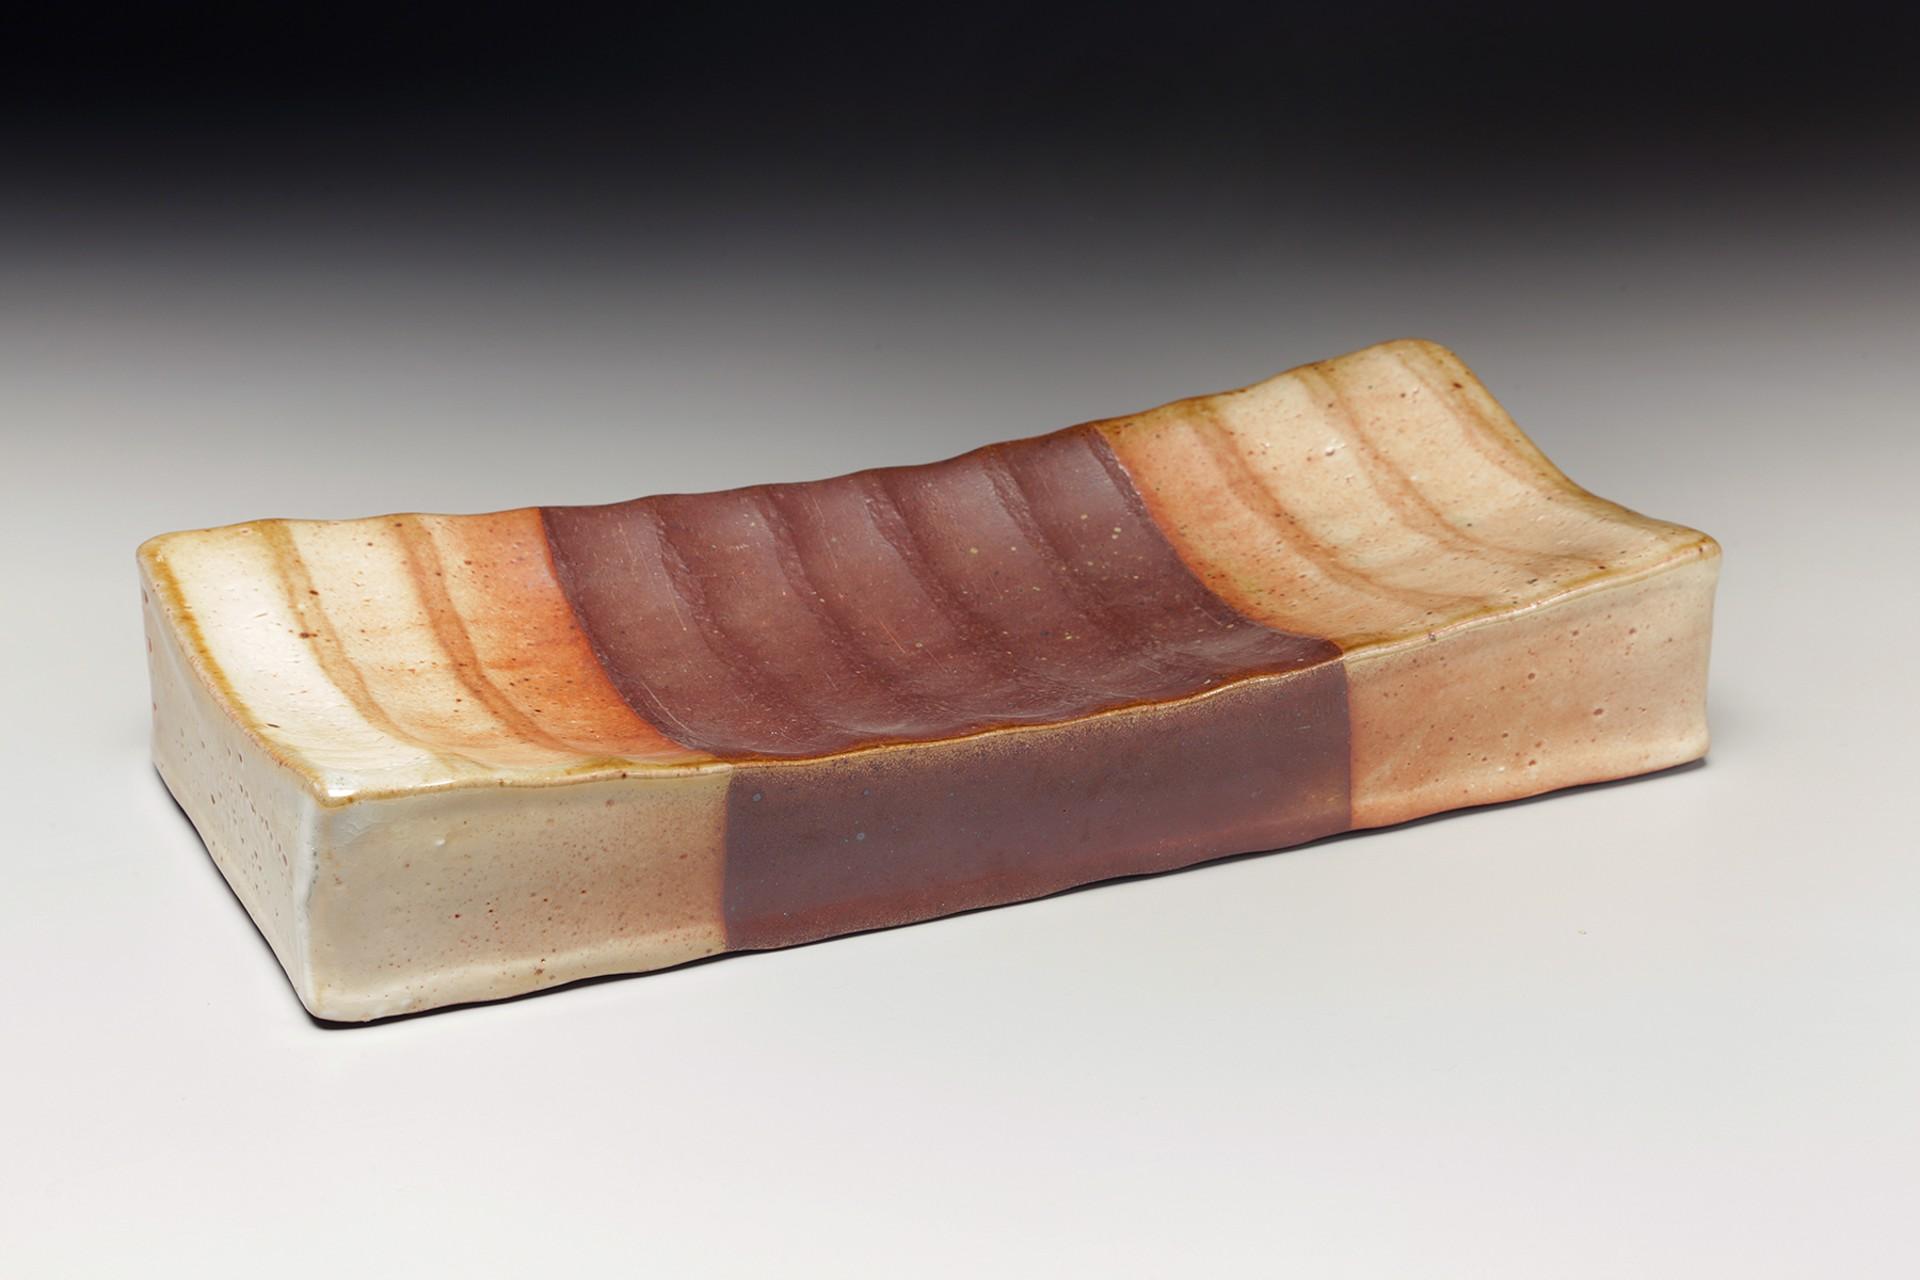 Dry Shino Hollow Form Tray by Nancy Green